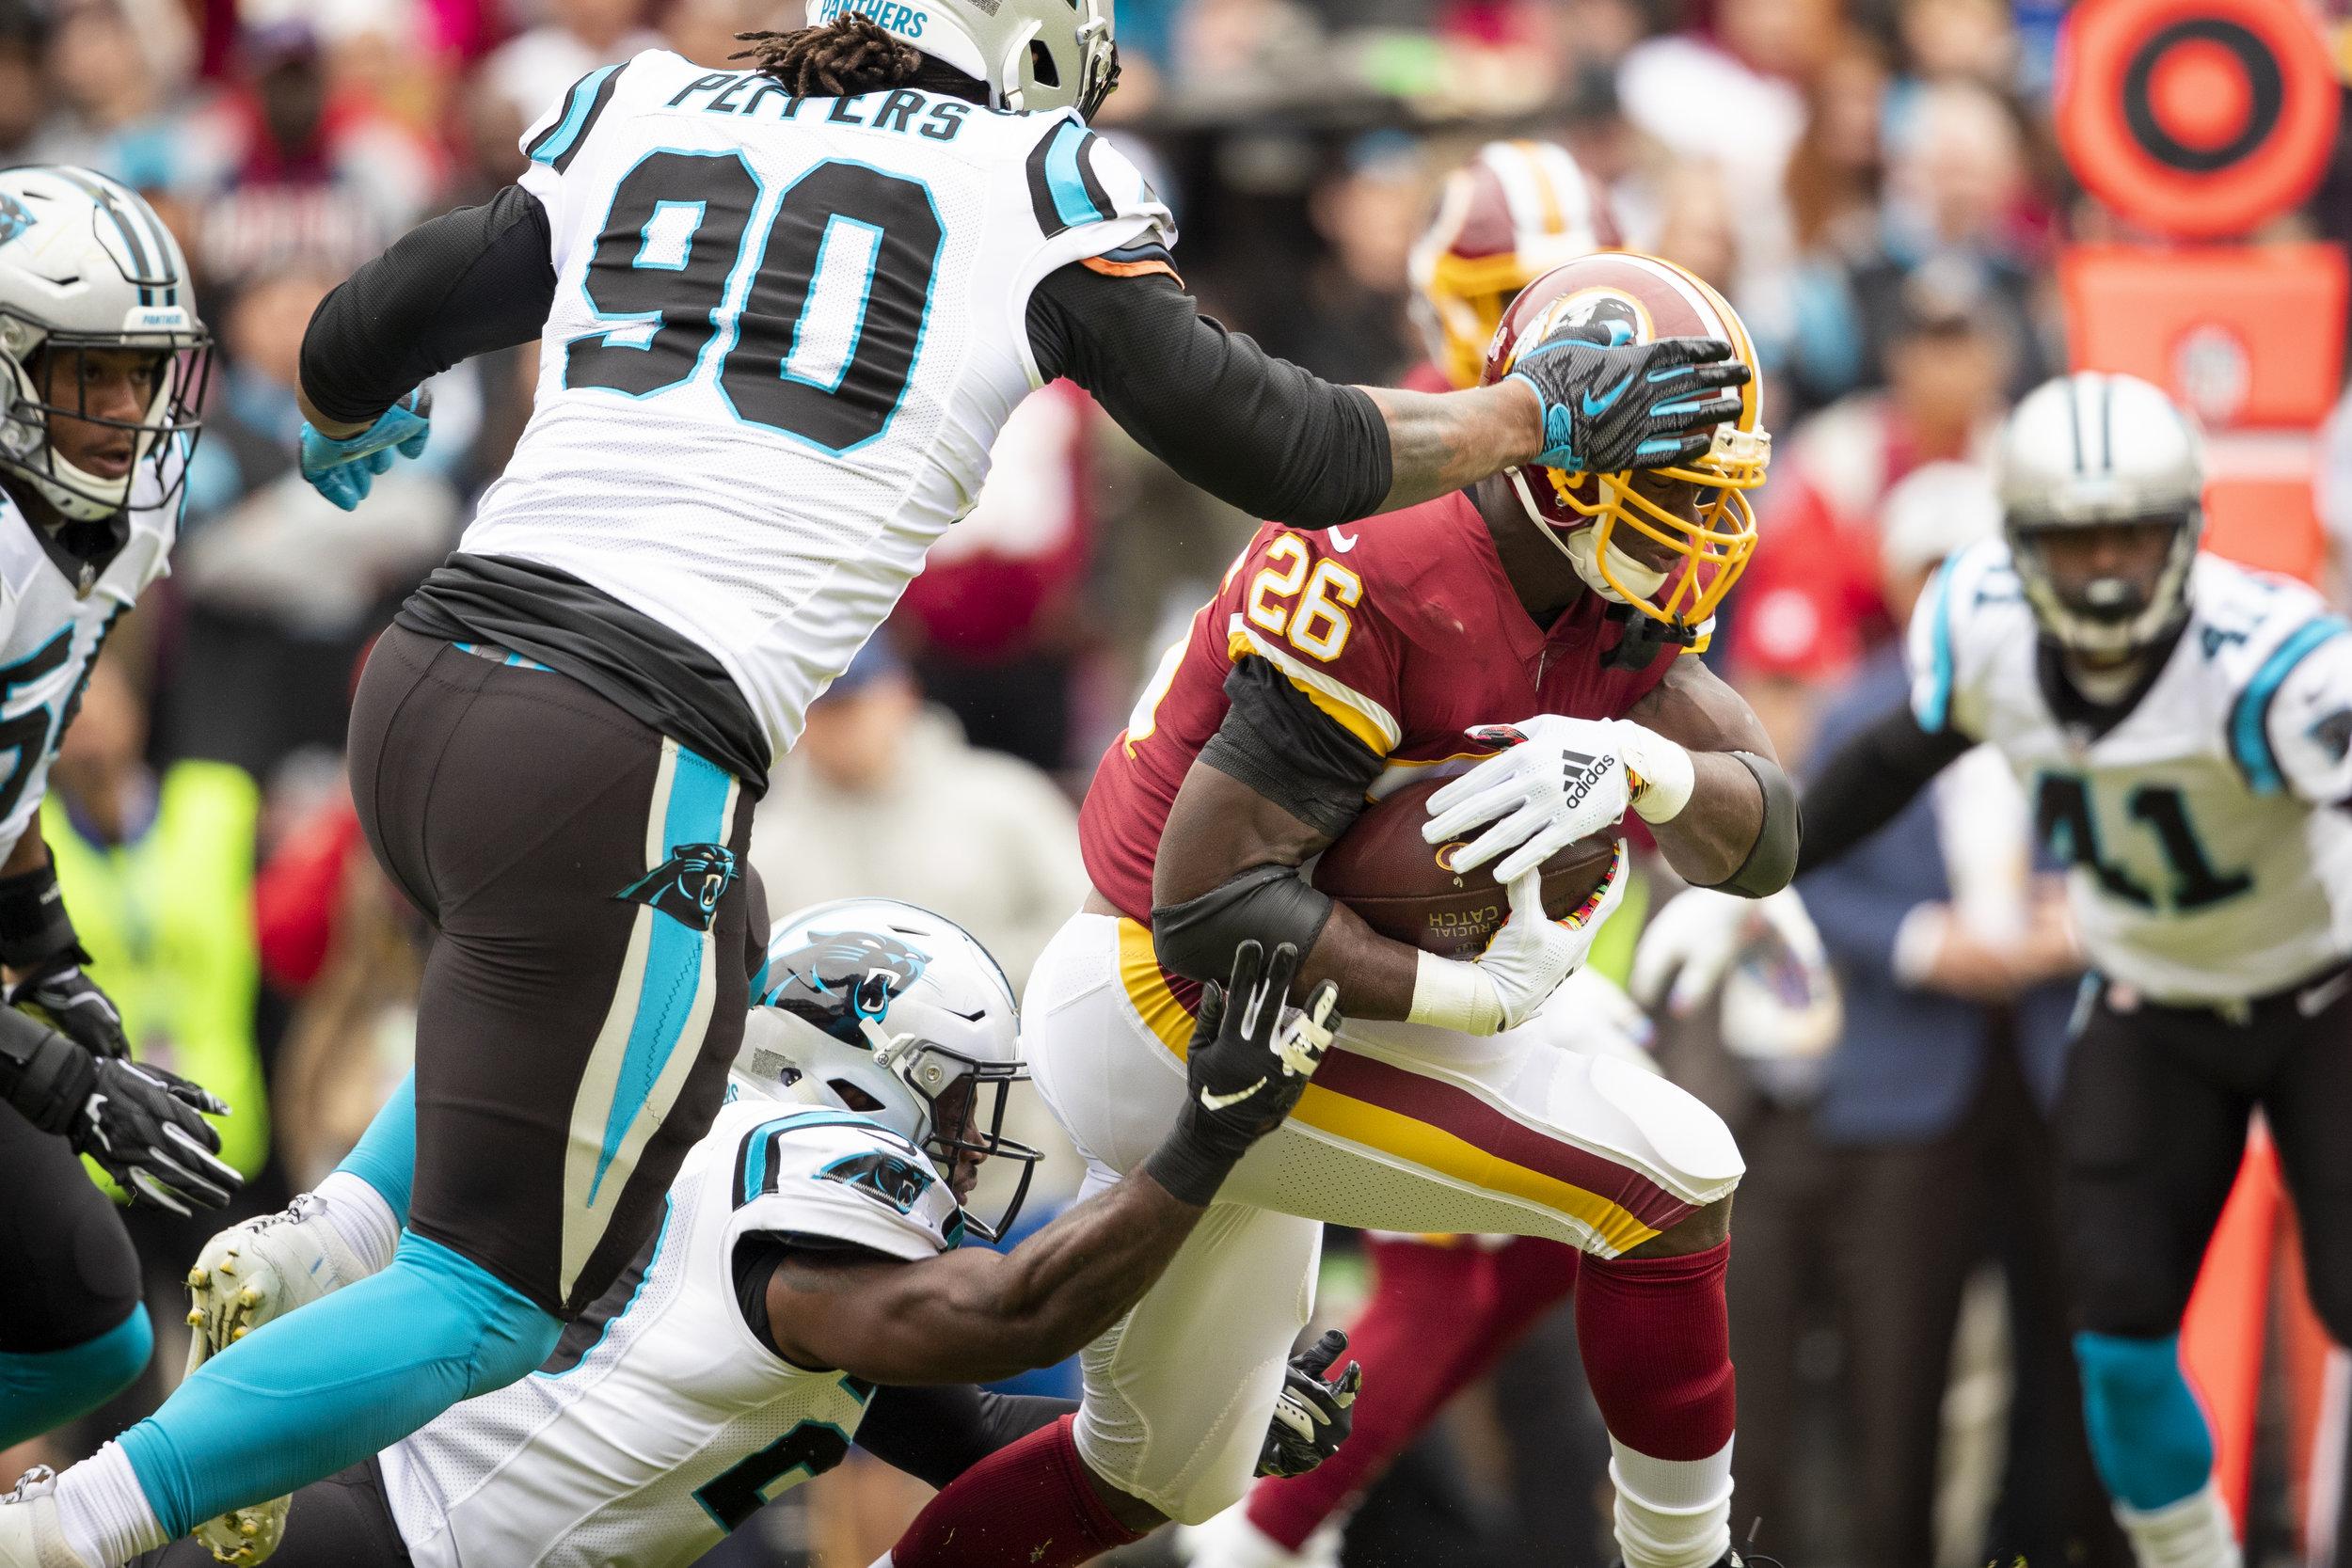 20181008_Redskins-Panthers_EMS_0022_1.jpg